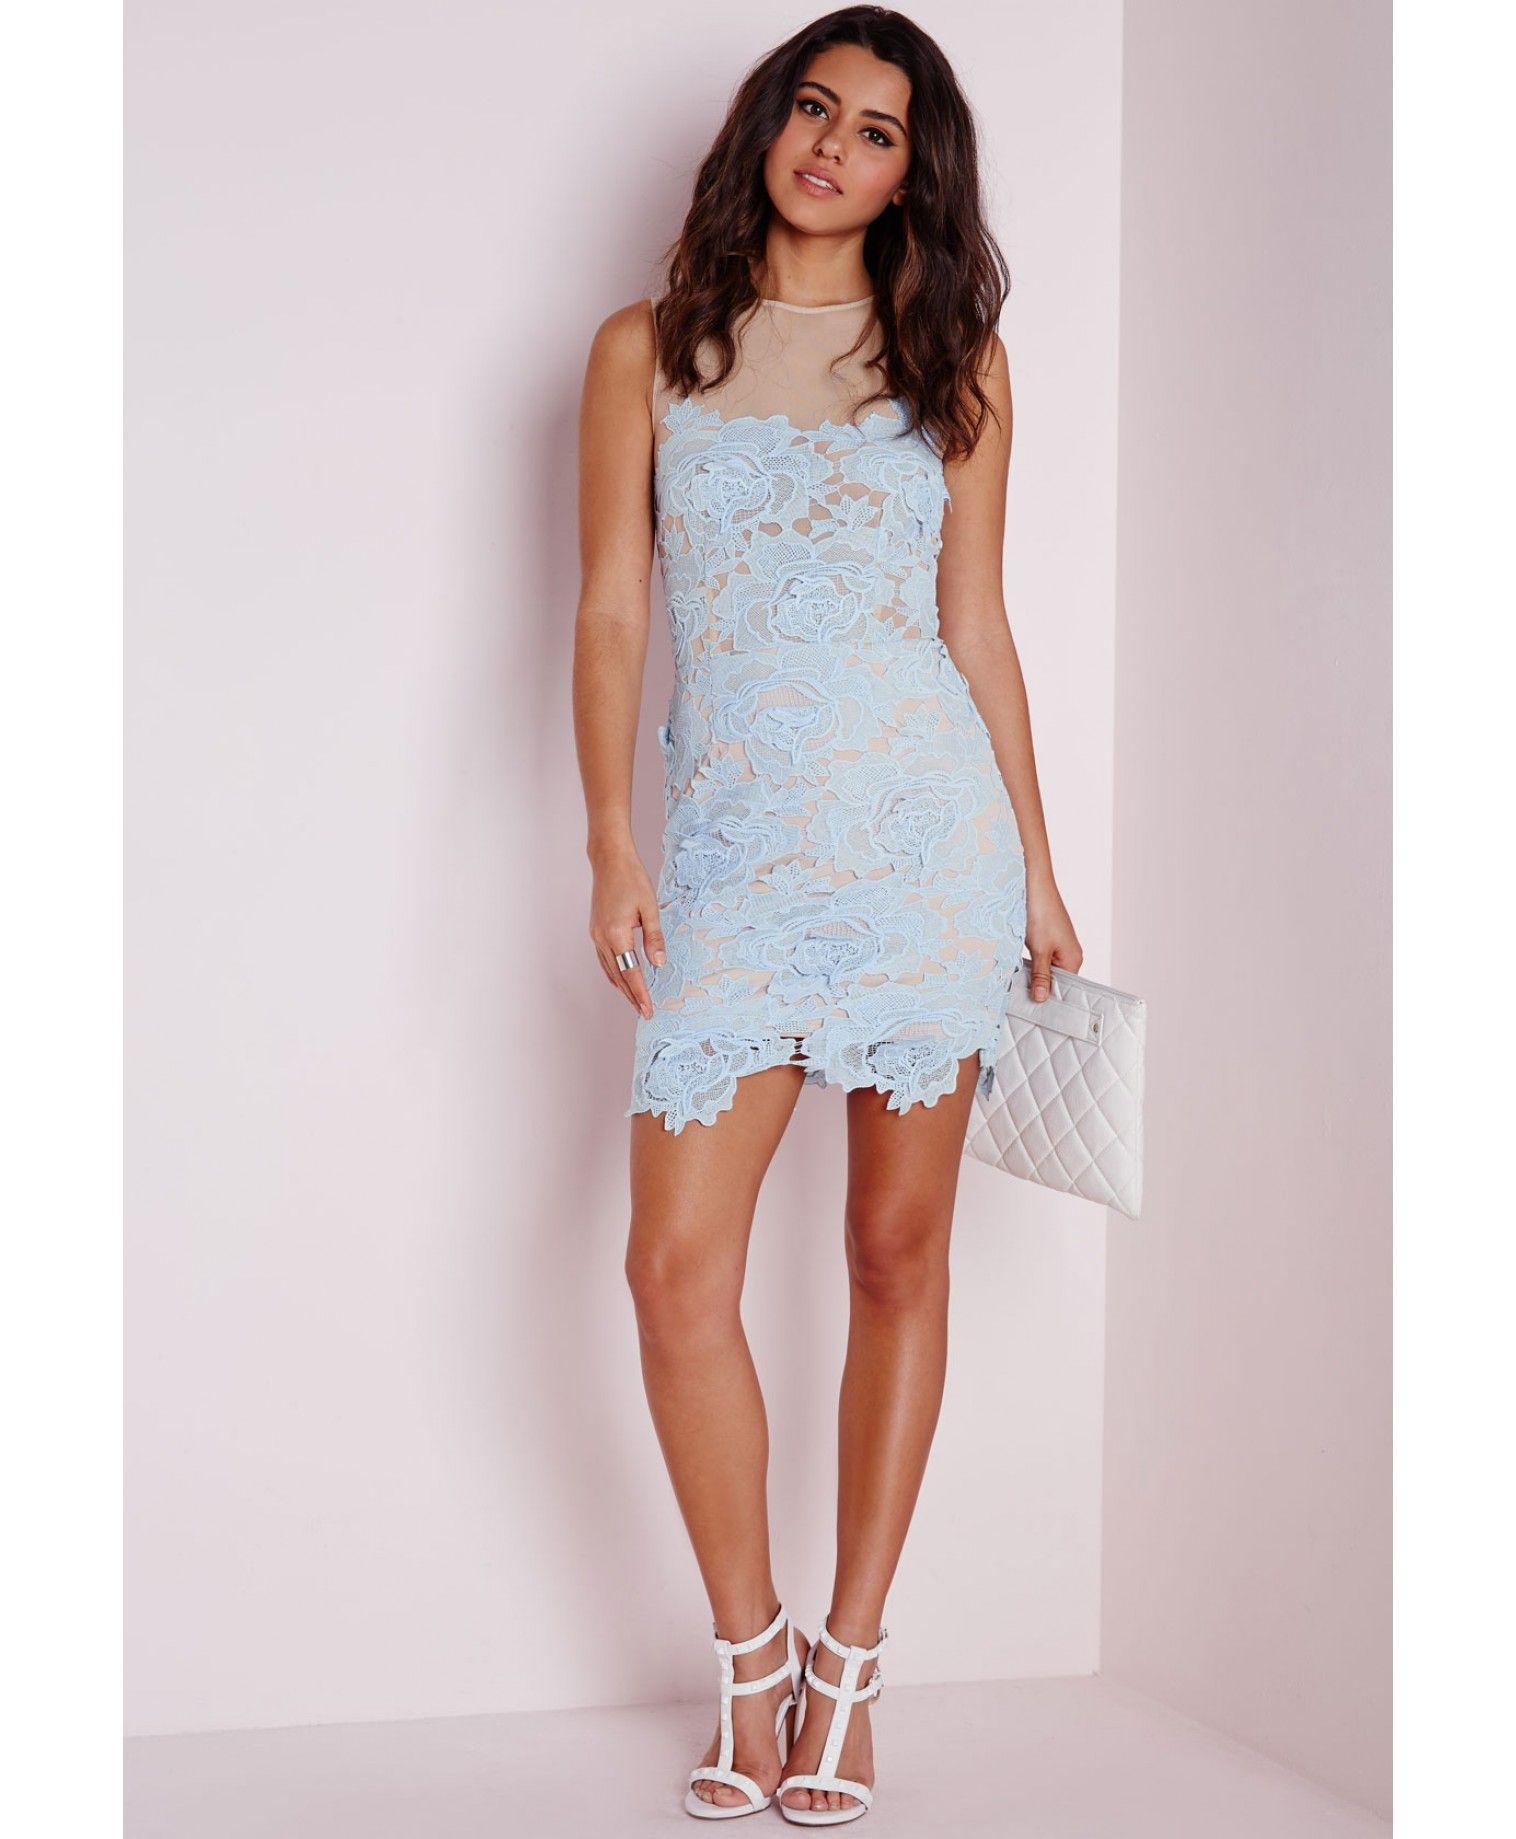 Asos Sukienka Niebieska Koronka 8 Uk 36 Evening Dresses Lace Dress Dresses